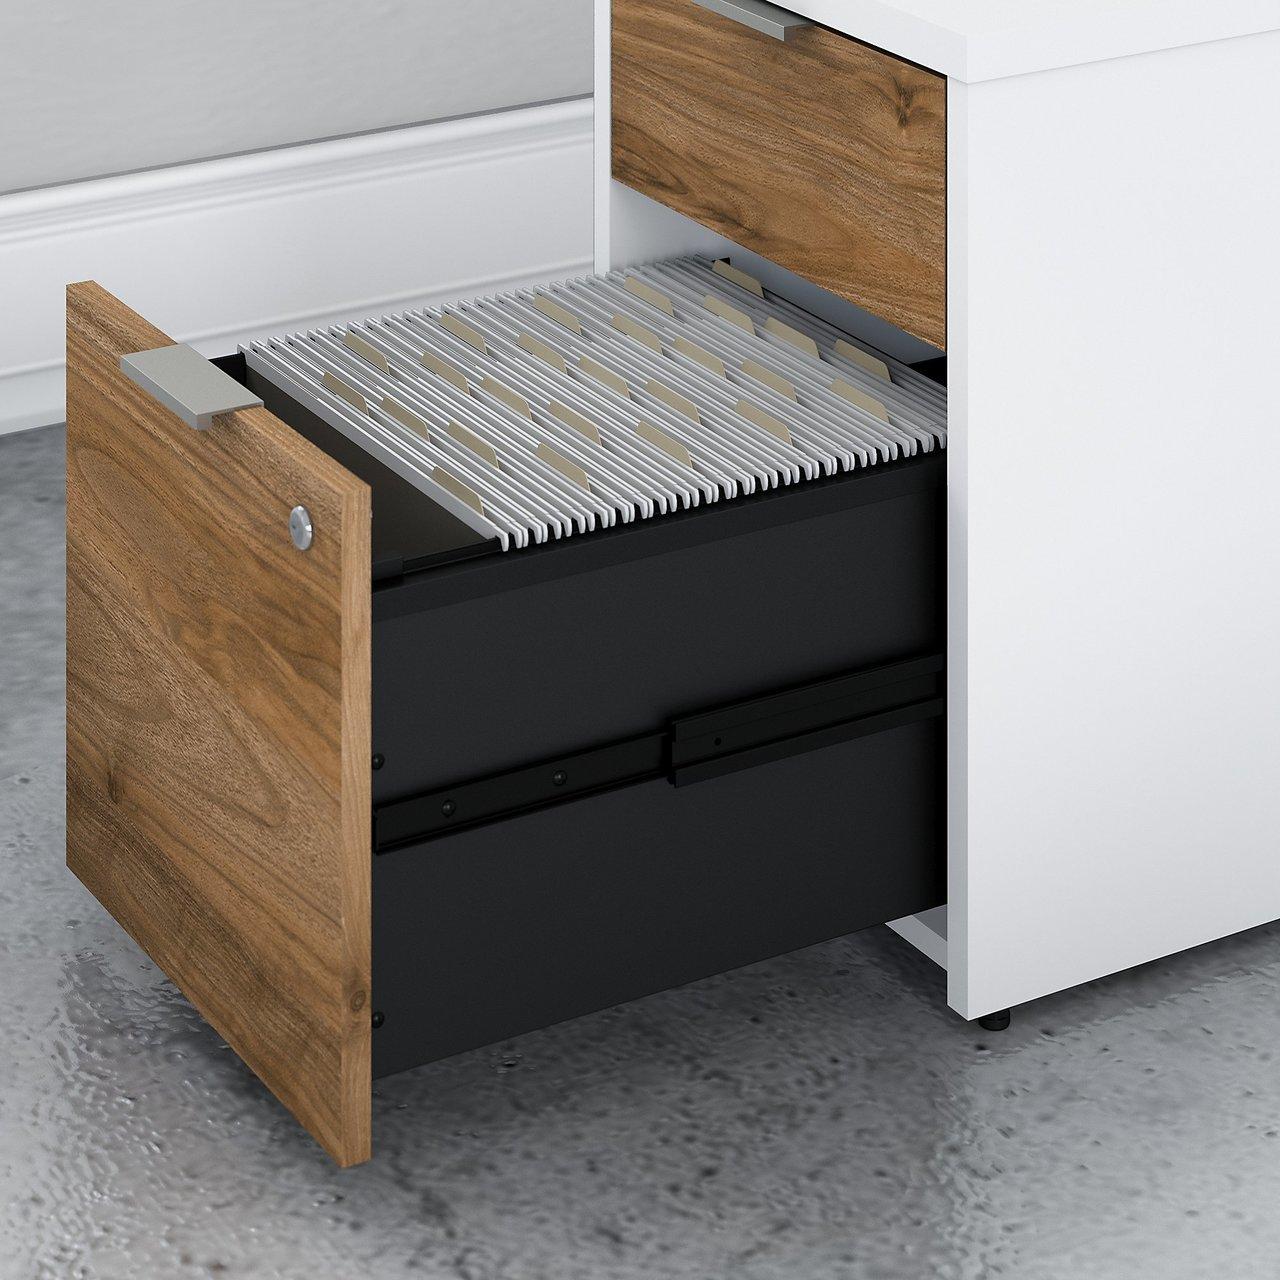 jamestown collection file drawer